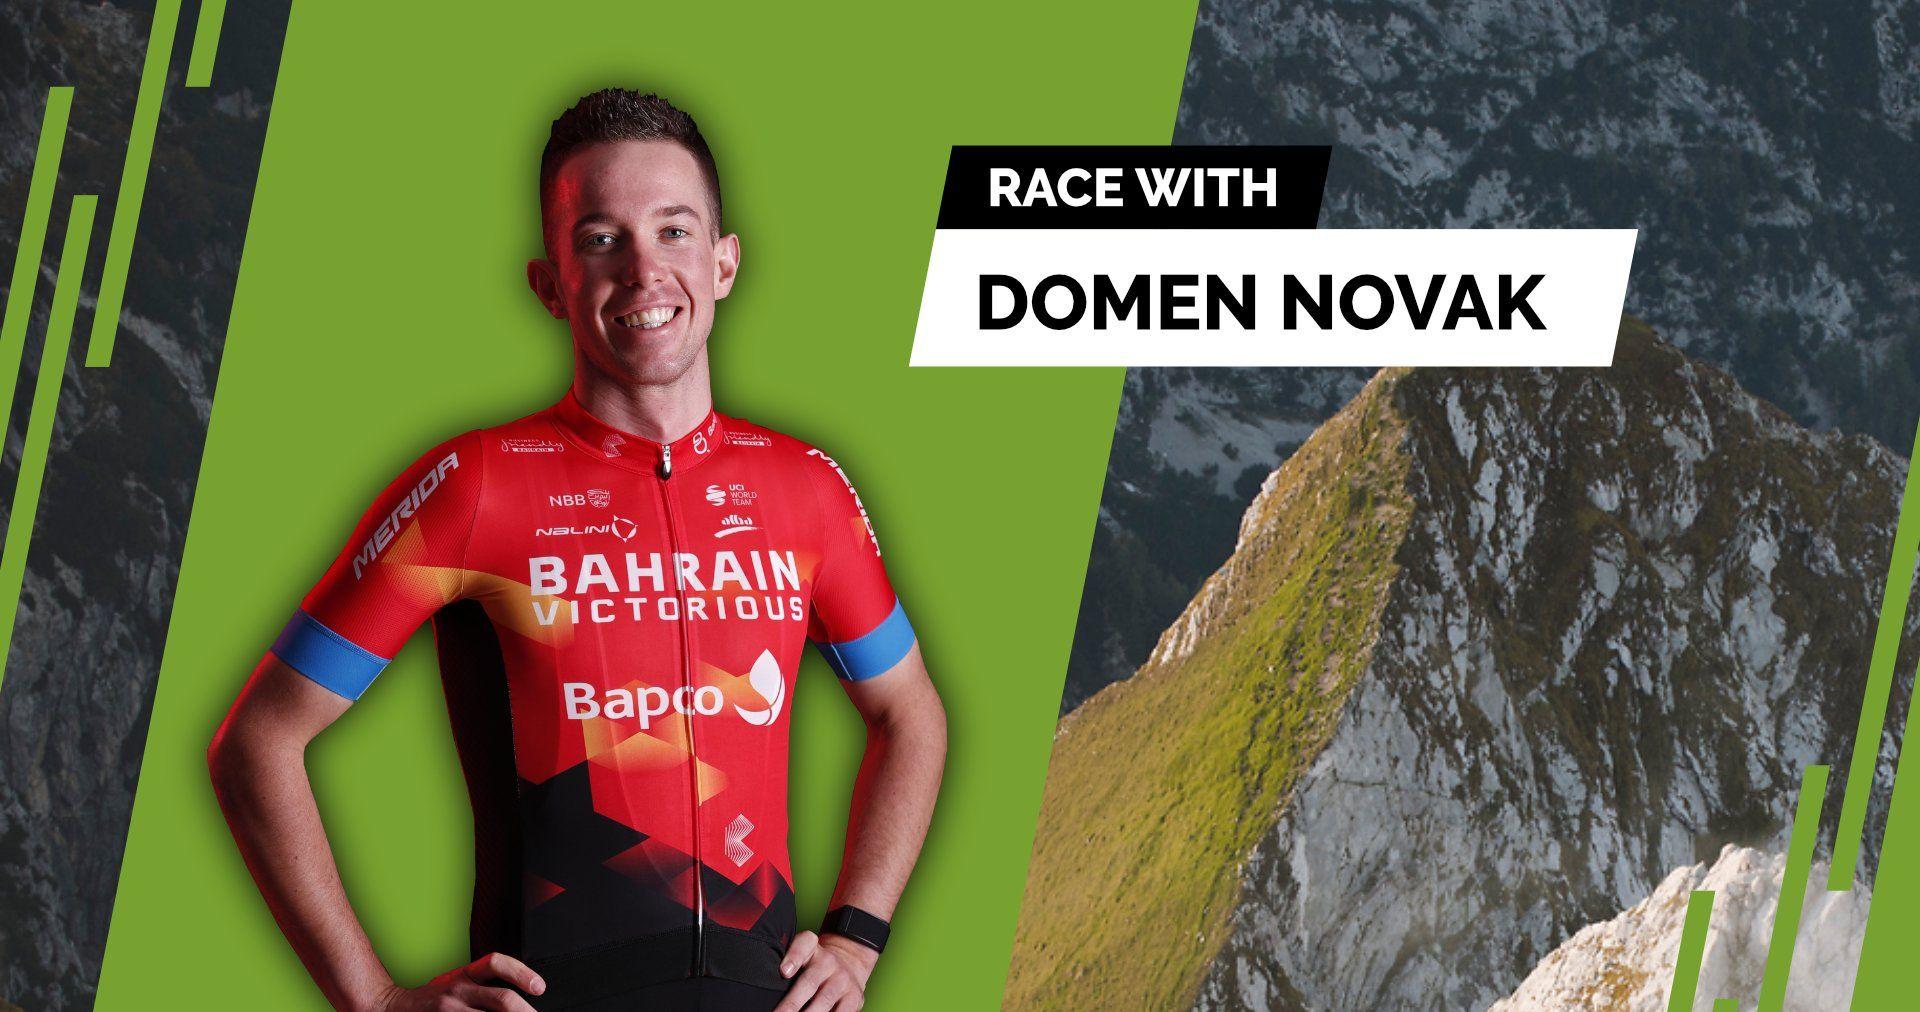 """I feel Slovenia"" - Virtual Tour of Slovenia | Stage 3 with Domen Novak and Aljaž Turk"